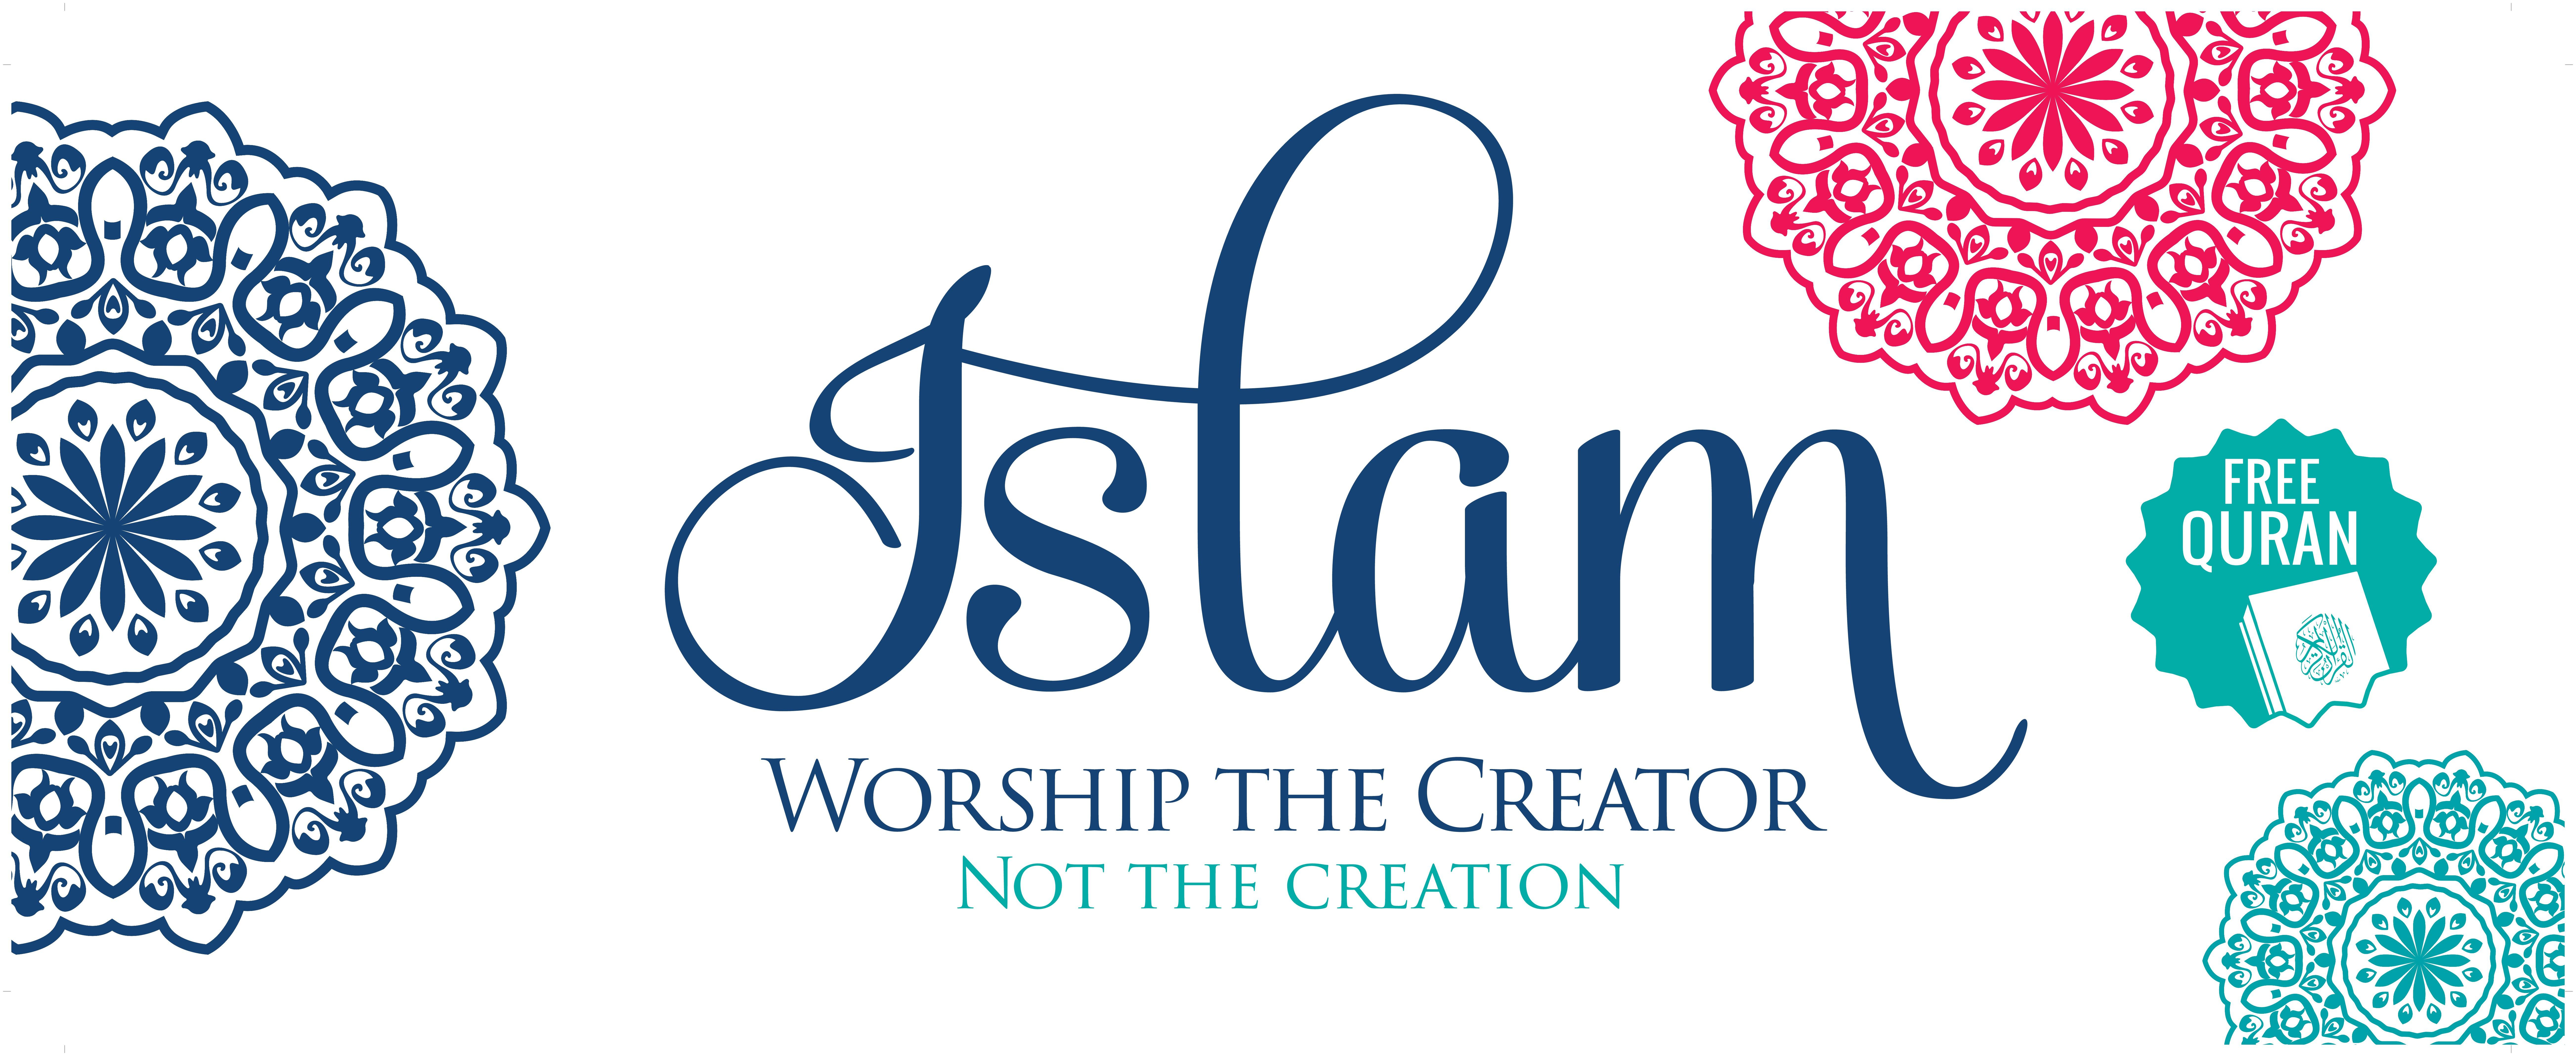 """ISLAM, worship the Creator"" artistic Banner!"